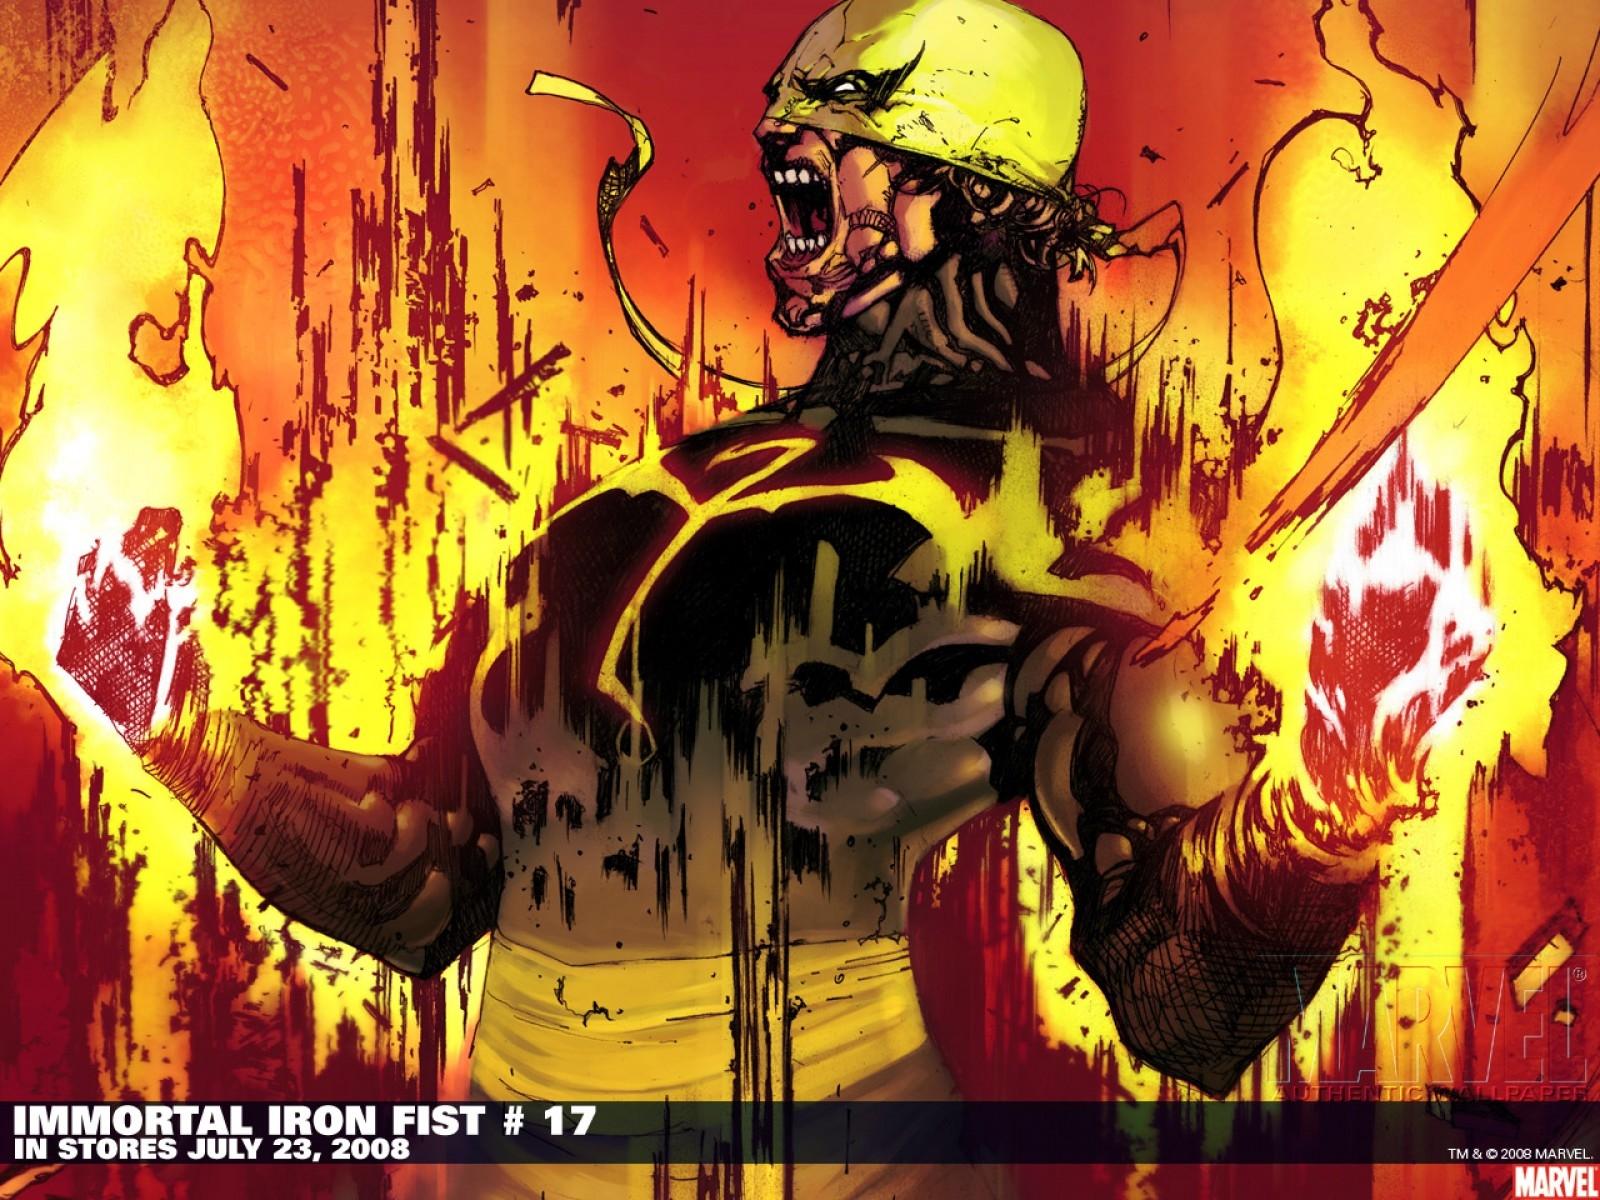 immortal iron fist desktop wallpaper